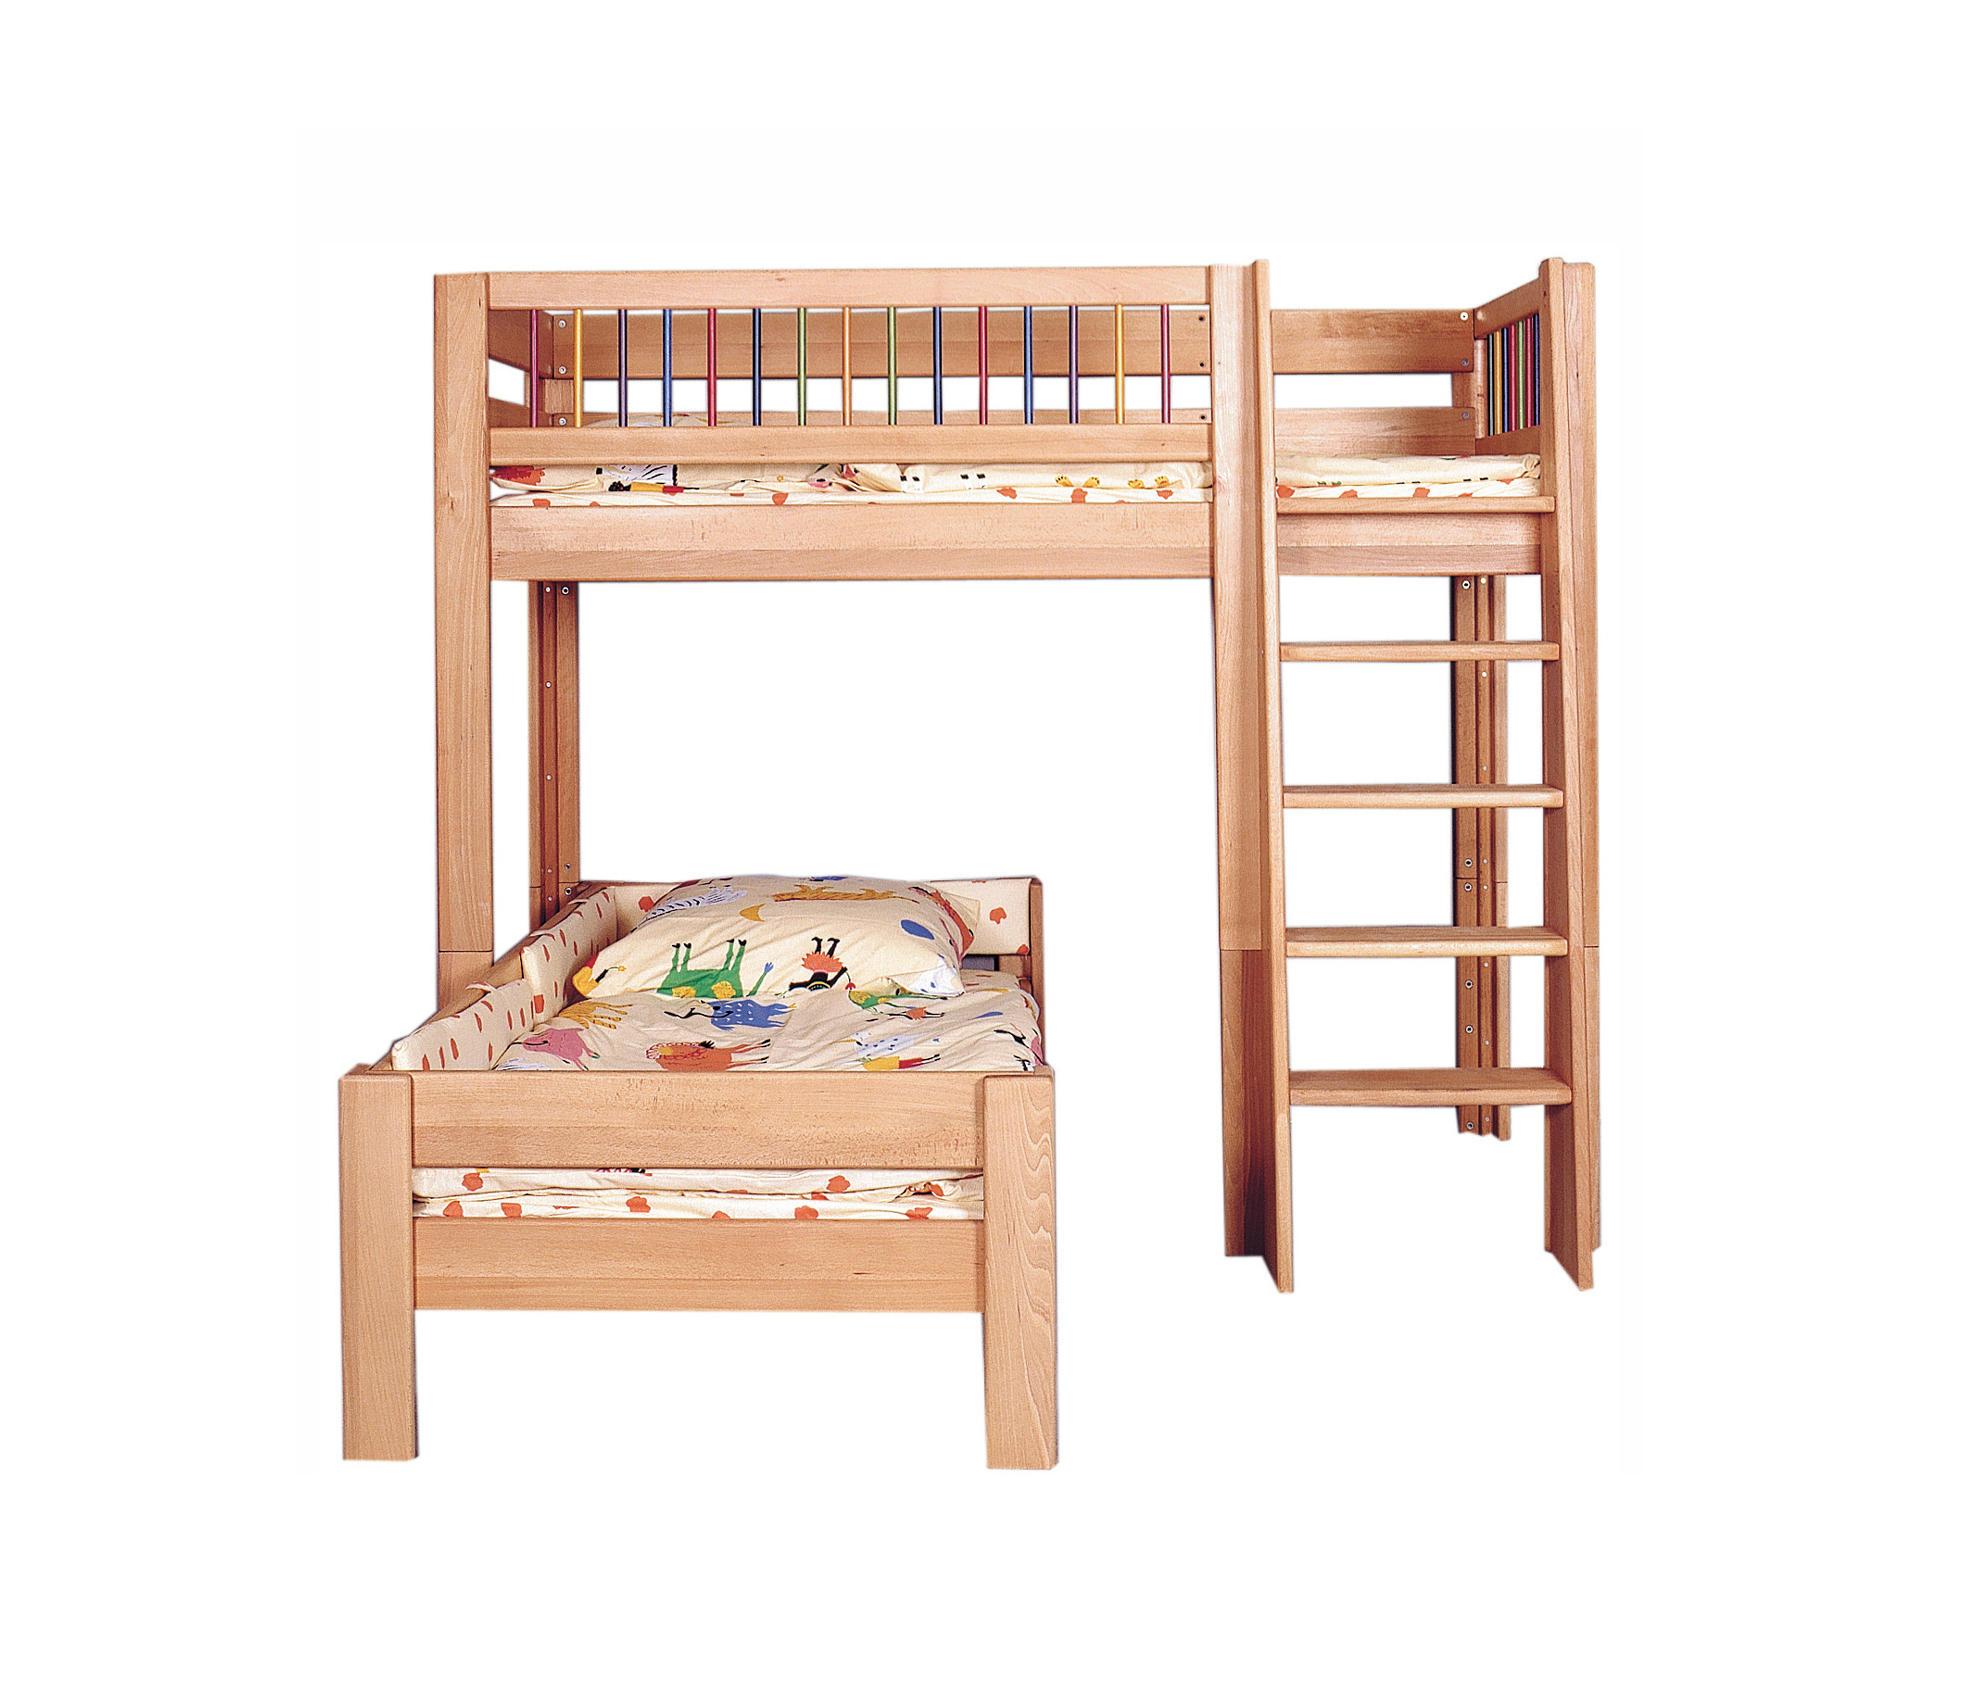 kubu ber eck etagenbett dba kinderbetten von de breuyn architonic. Black Bedroom Furniture Sets. Home Design Ideas